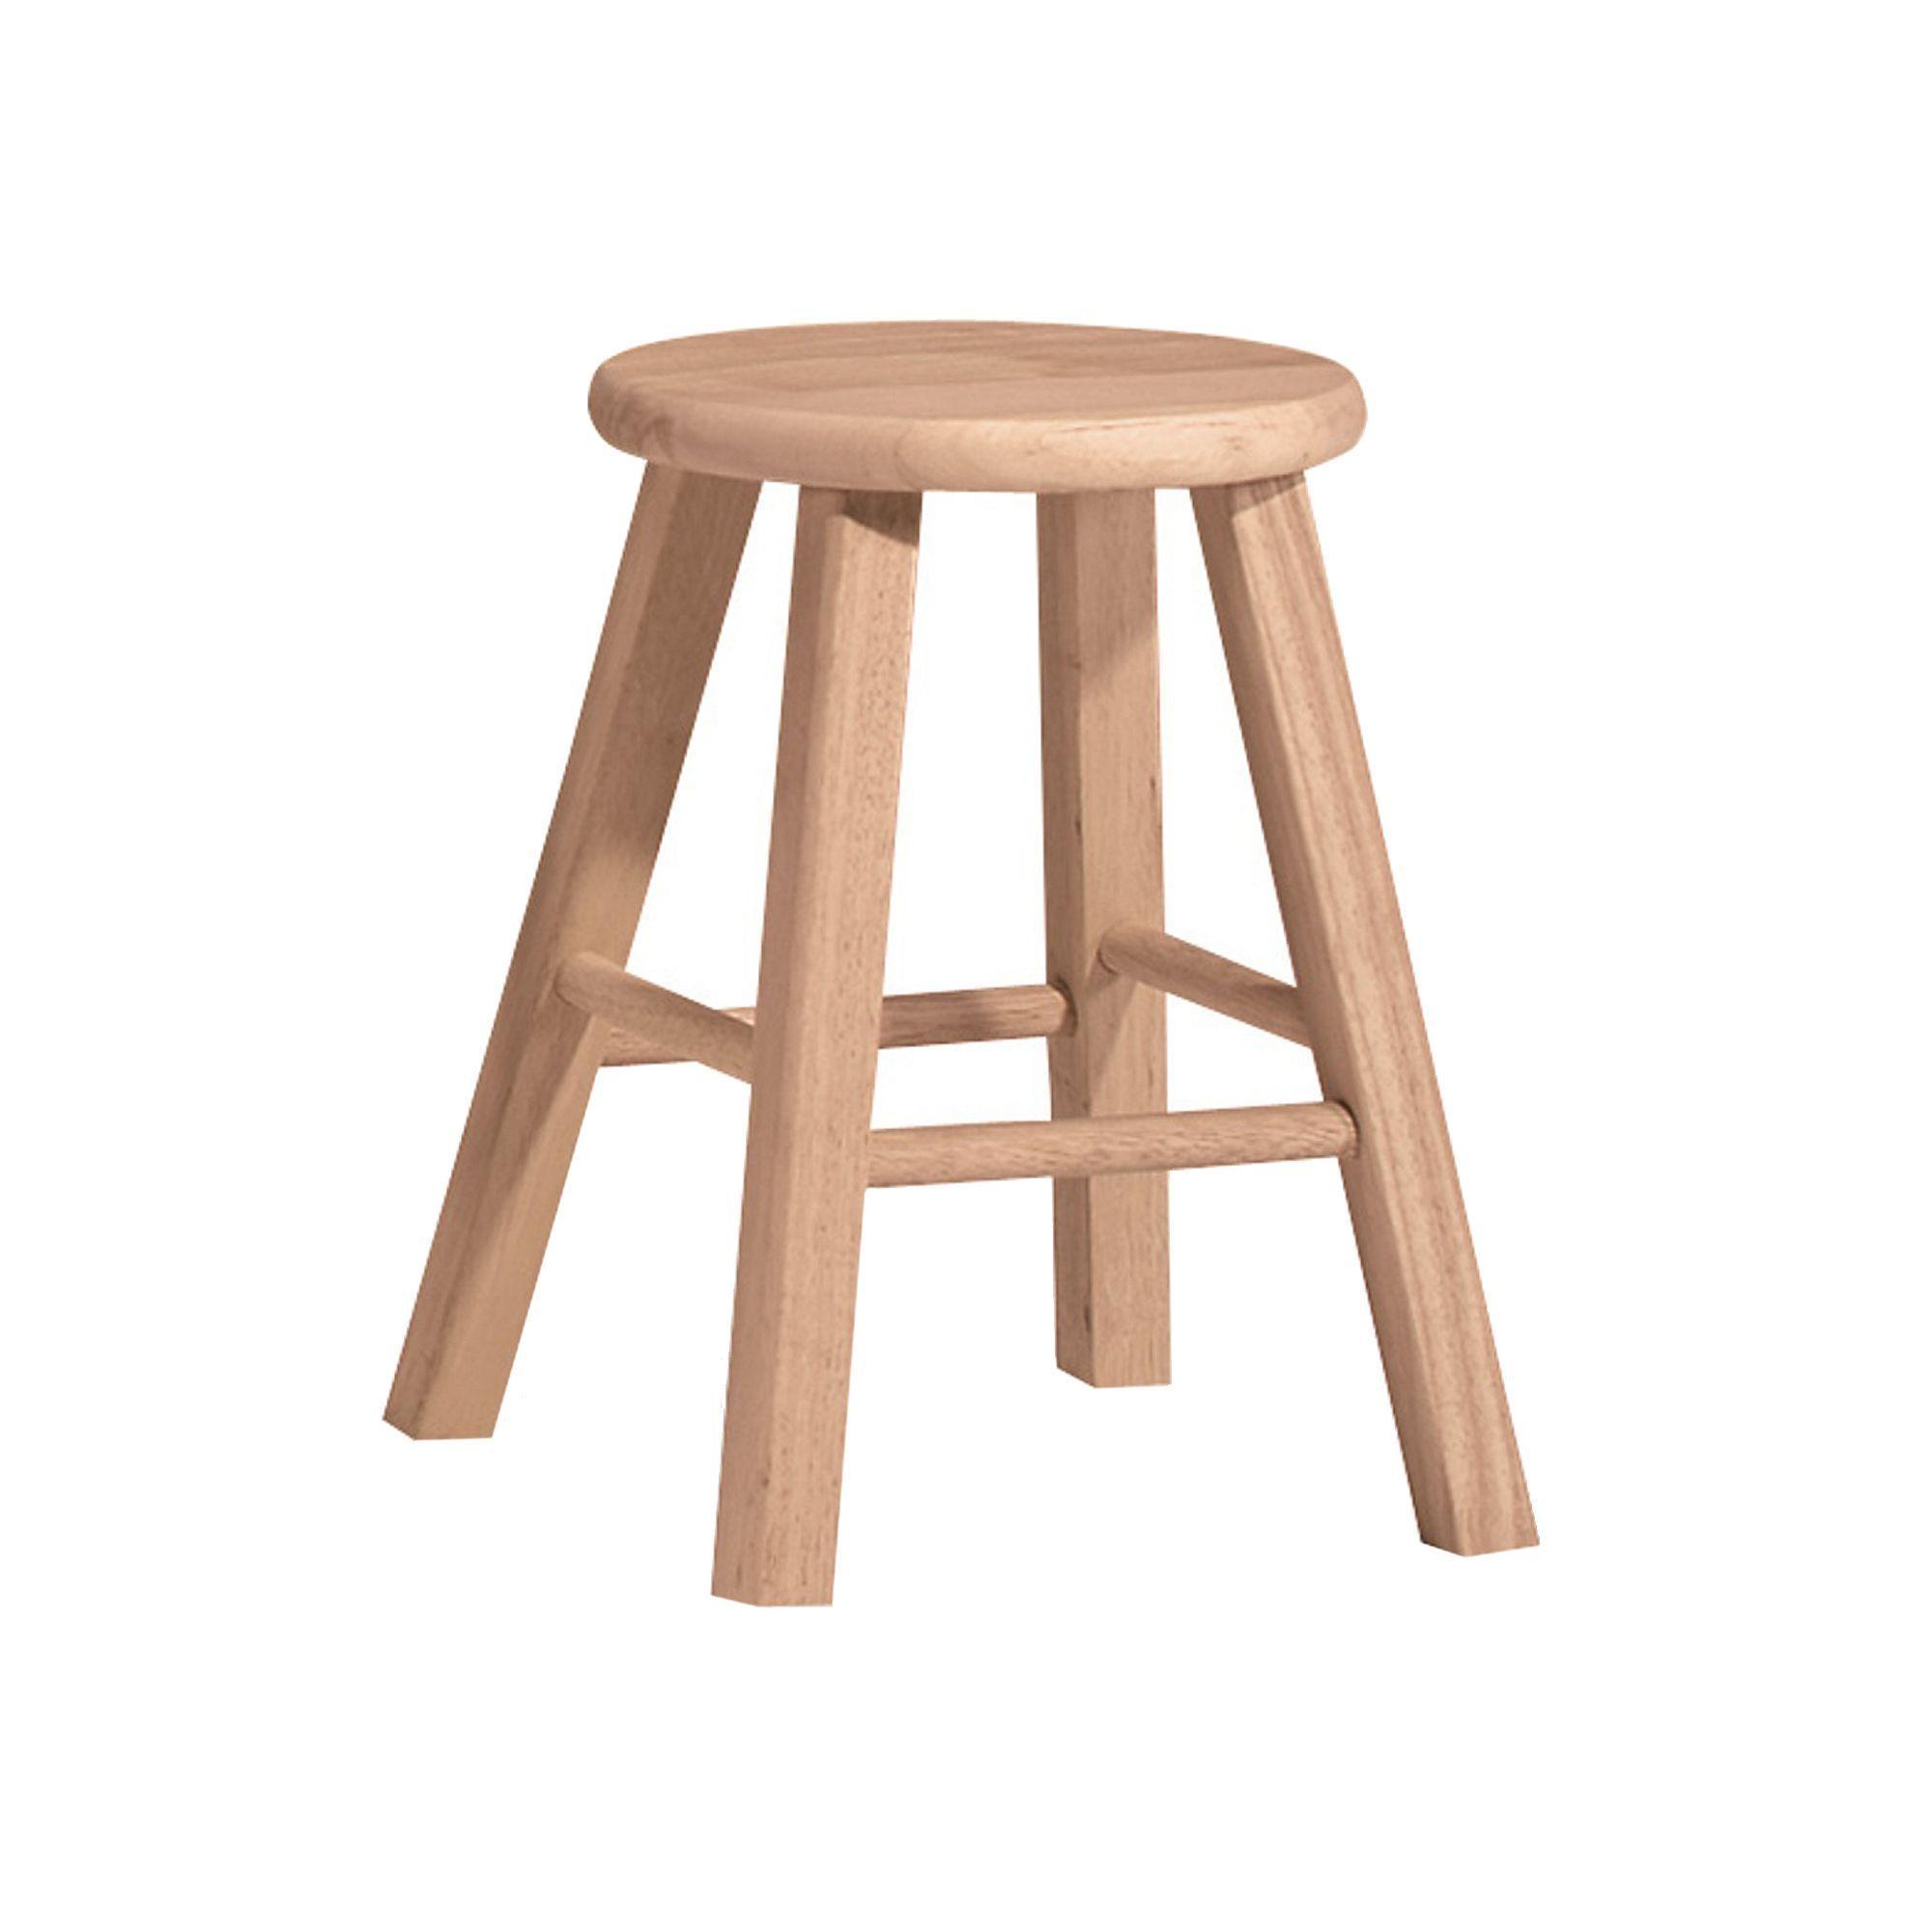 Round Top Table Stool Round Stool Stool Bar Stools